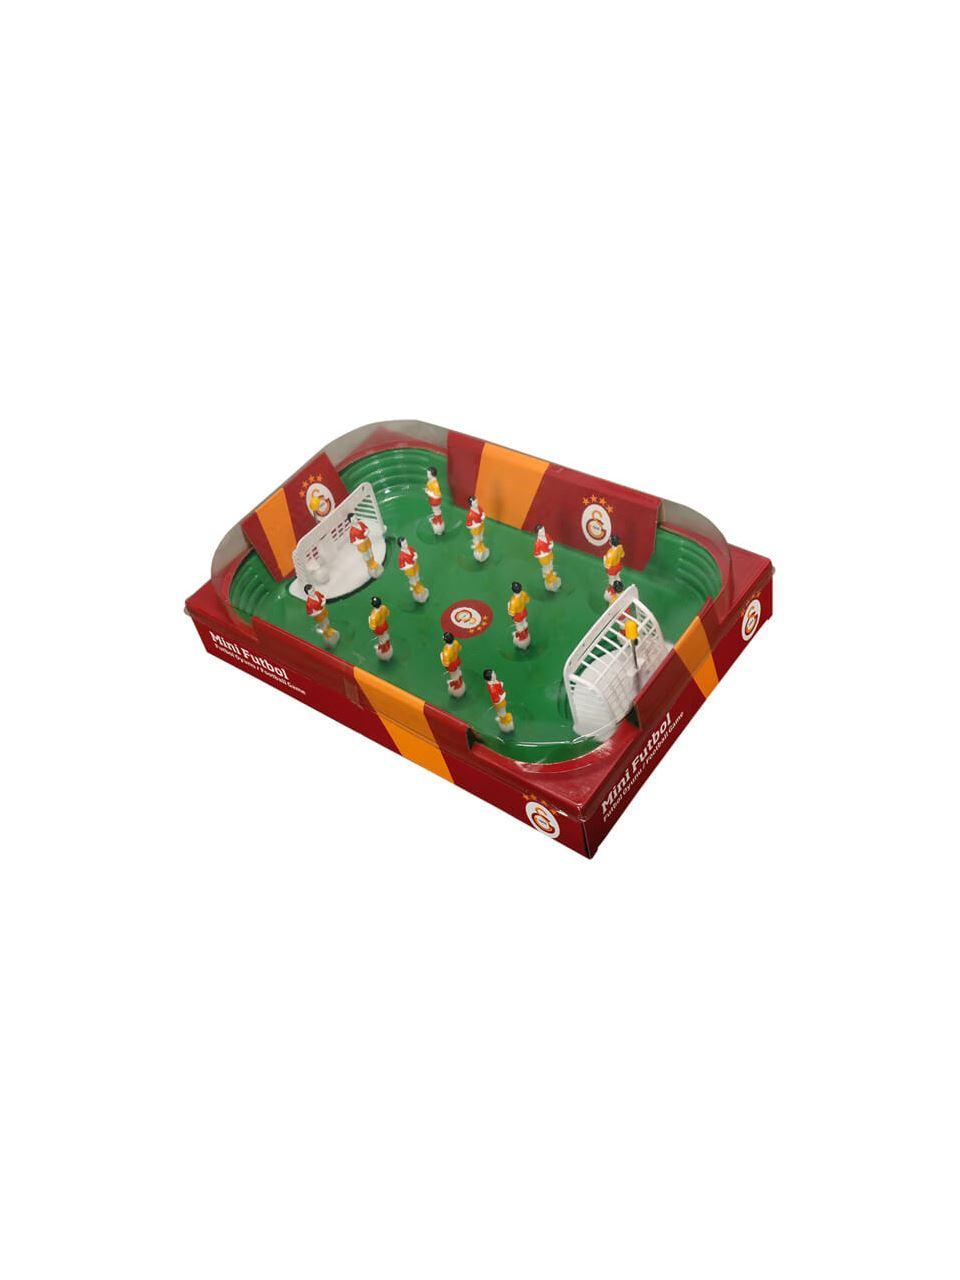 U880830 GS Mini Futbol Oyunu